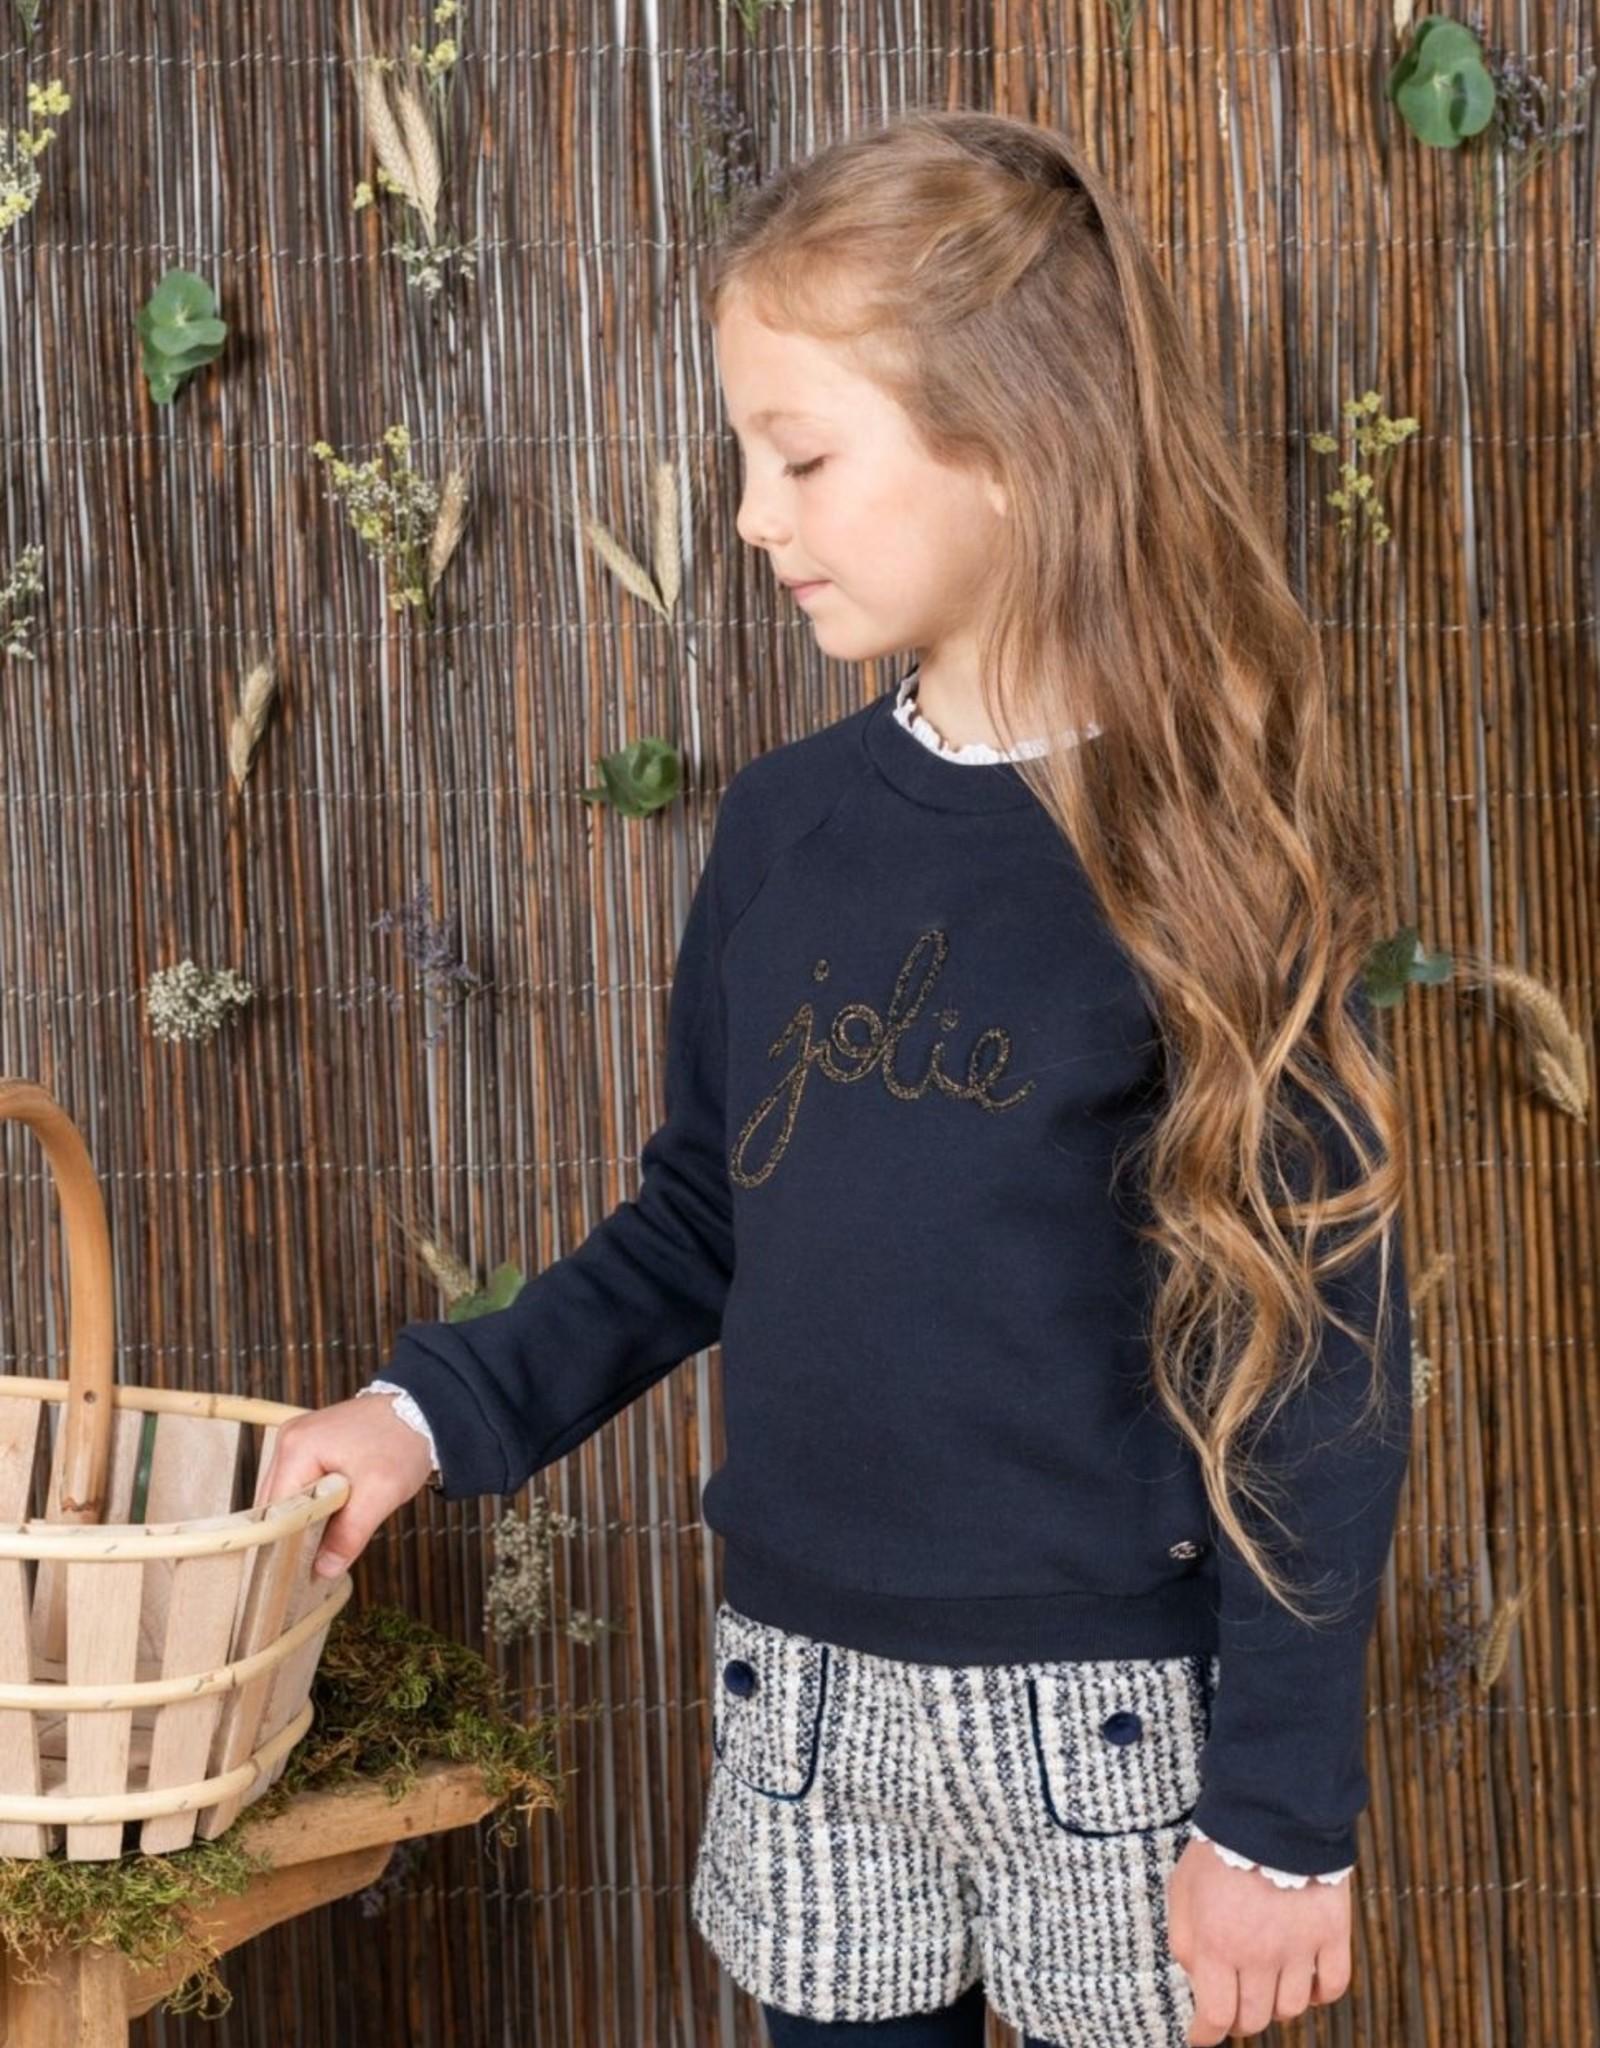 TARTINE ET CHOCOLAT TARTINE ET CHOCOLAT Sweater TT15002 04